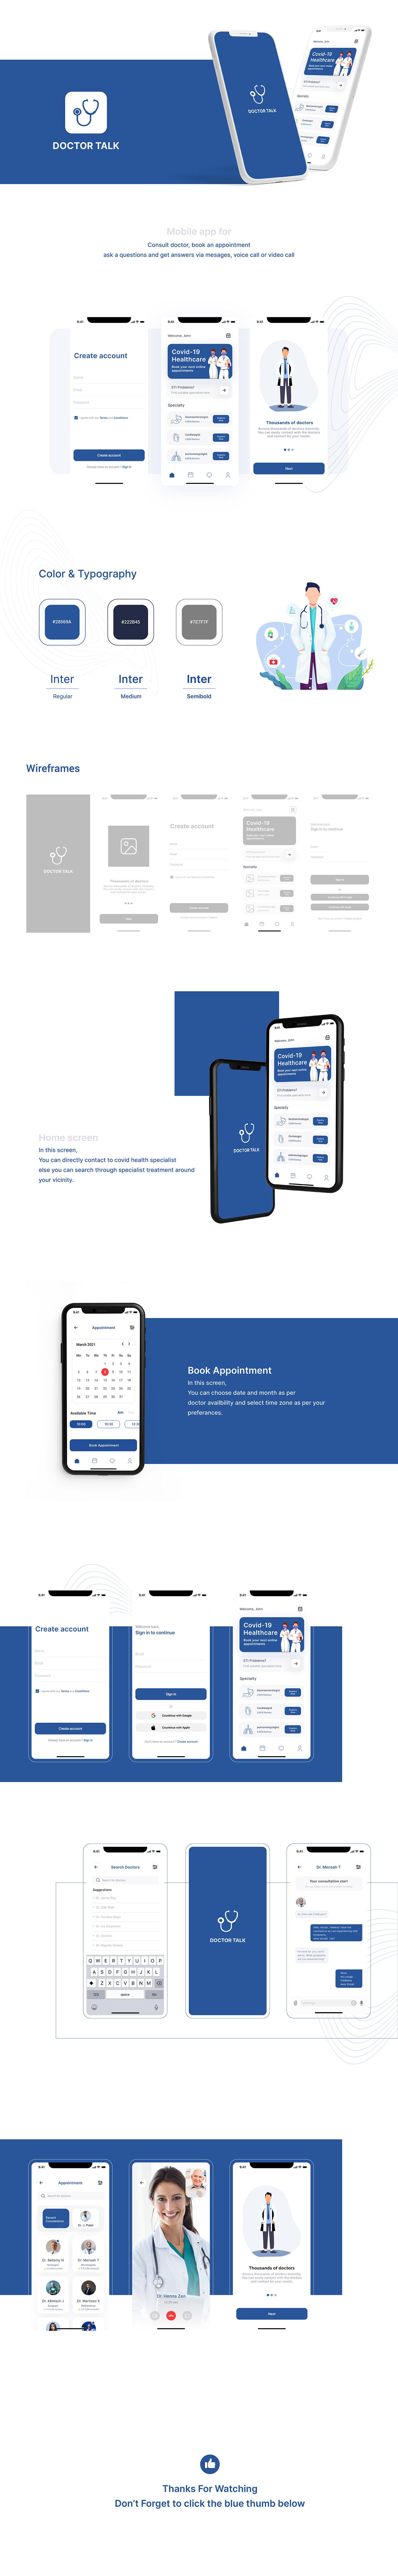 app design Appointment Booking doctor app doctor booking app Doctor Consultation Mobile app mobile app design UI/UX